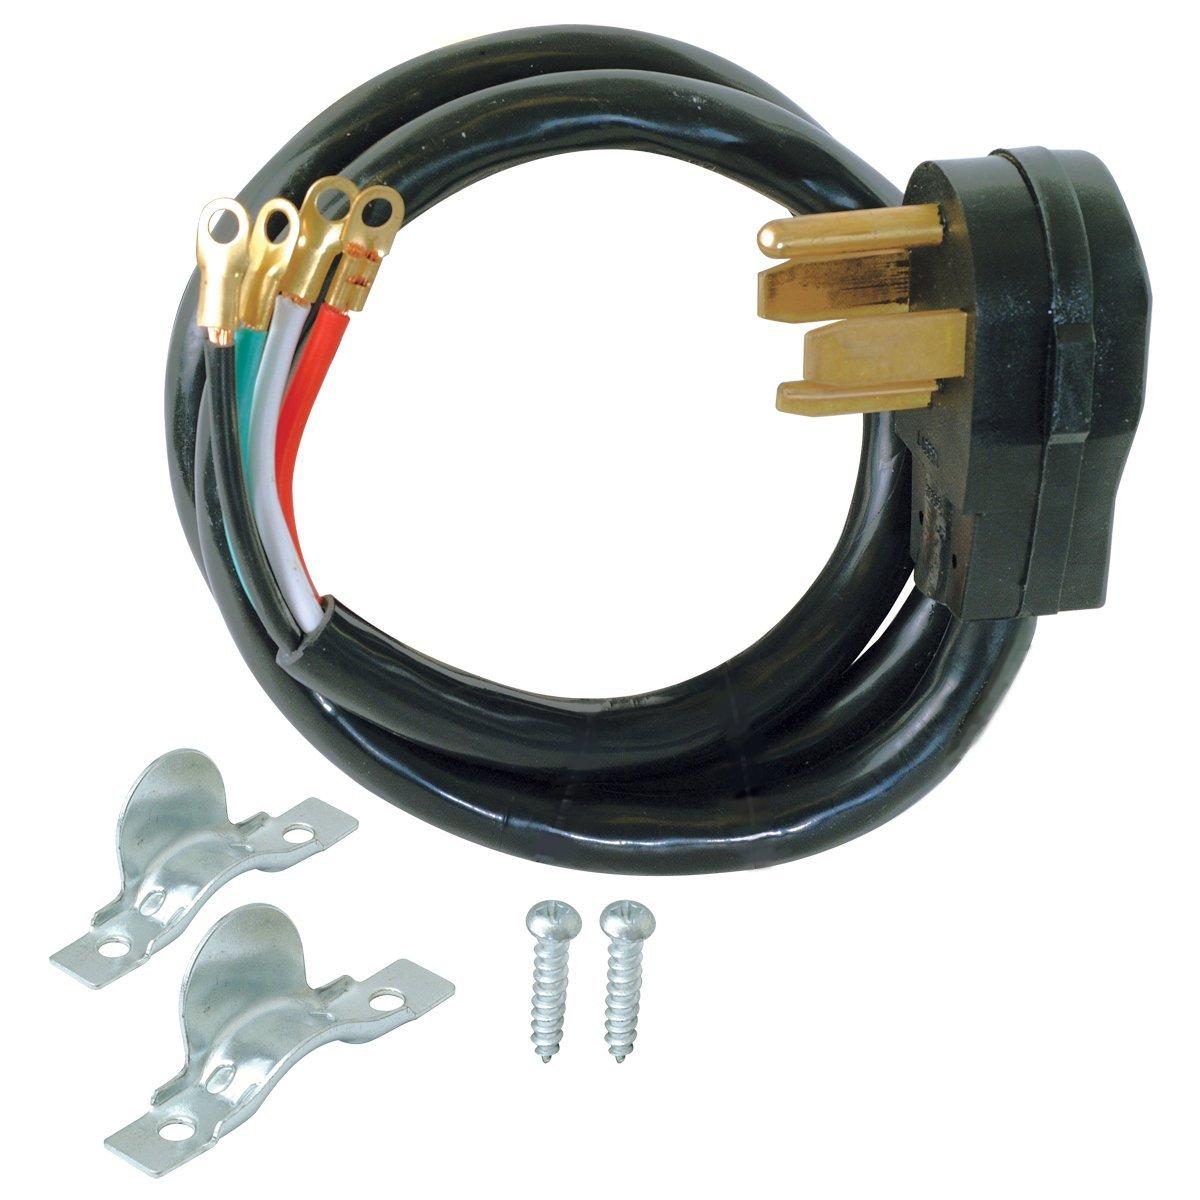 EZ-FLO 61259 4-Prong Dryer Cord - 30 Amp